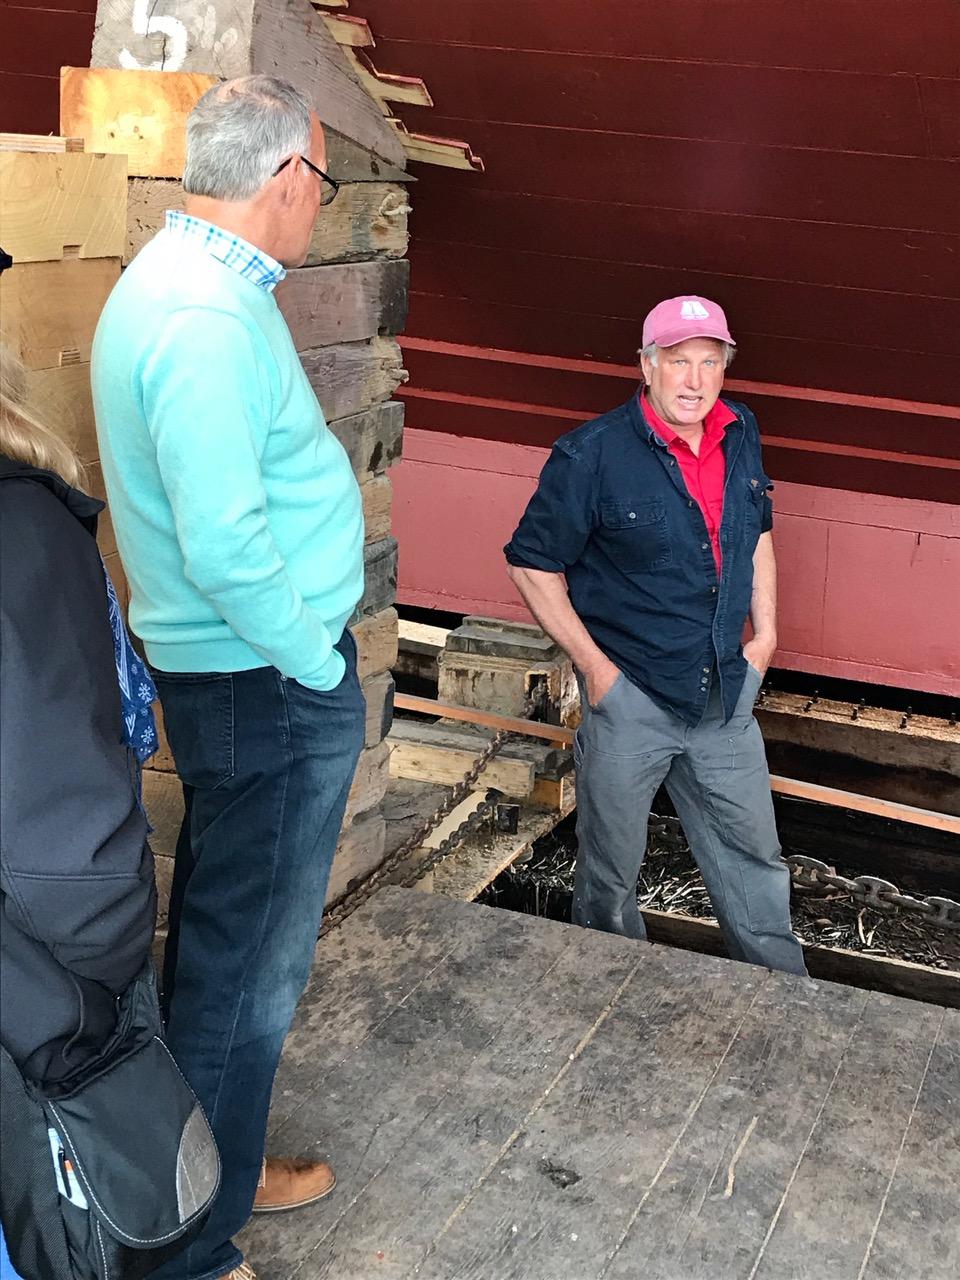 Captain Harold Burnham explained the work, here with Bob Hildreth. credit John Bullard